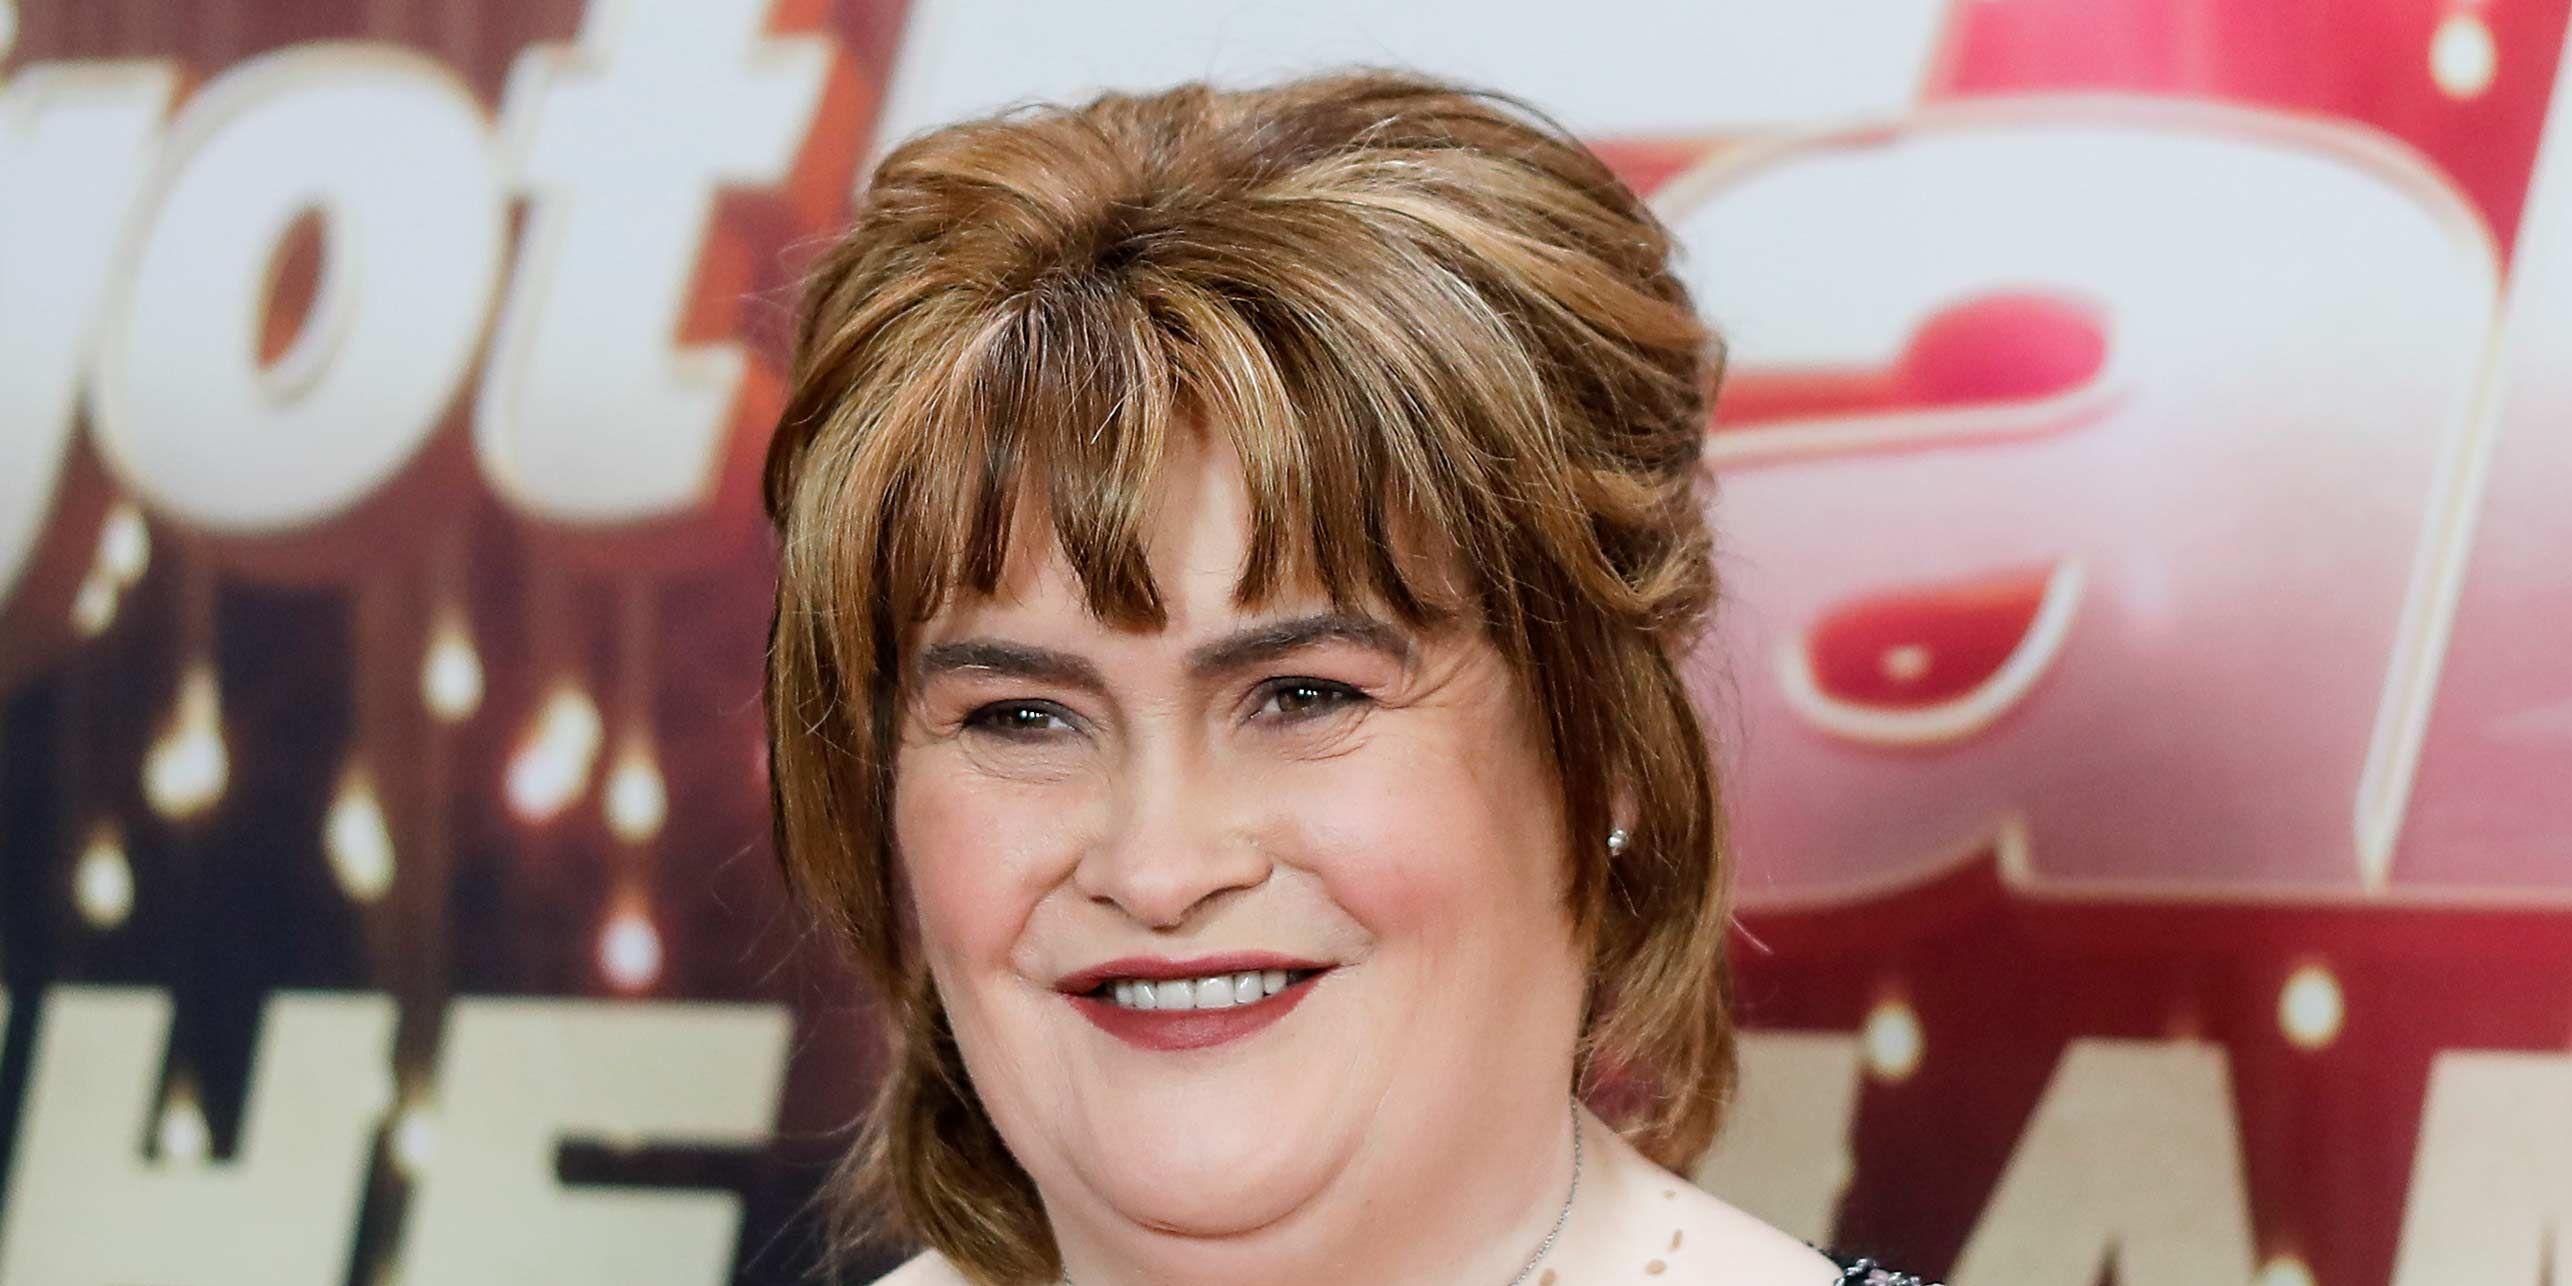 Susan Boyle at the America's Got Talent Champion Finale